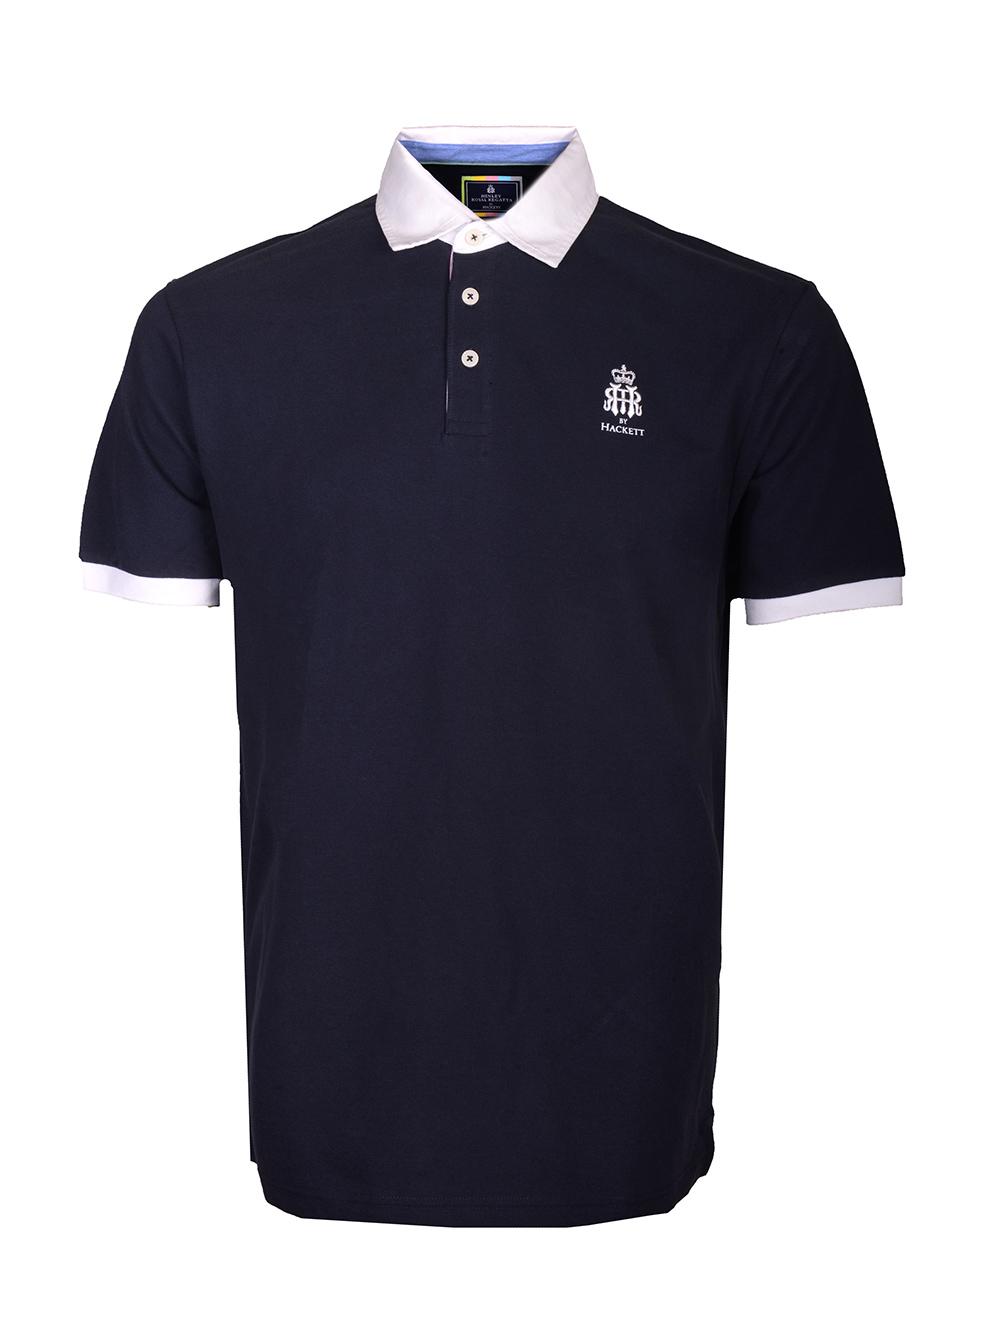 HACKETT Μπλούζα Polo HM562598-595 ΜΠΛΕ